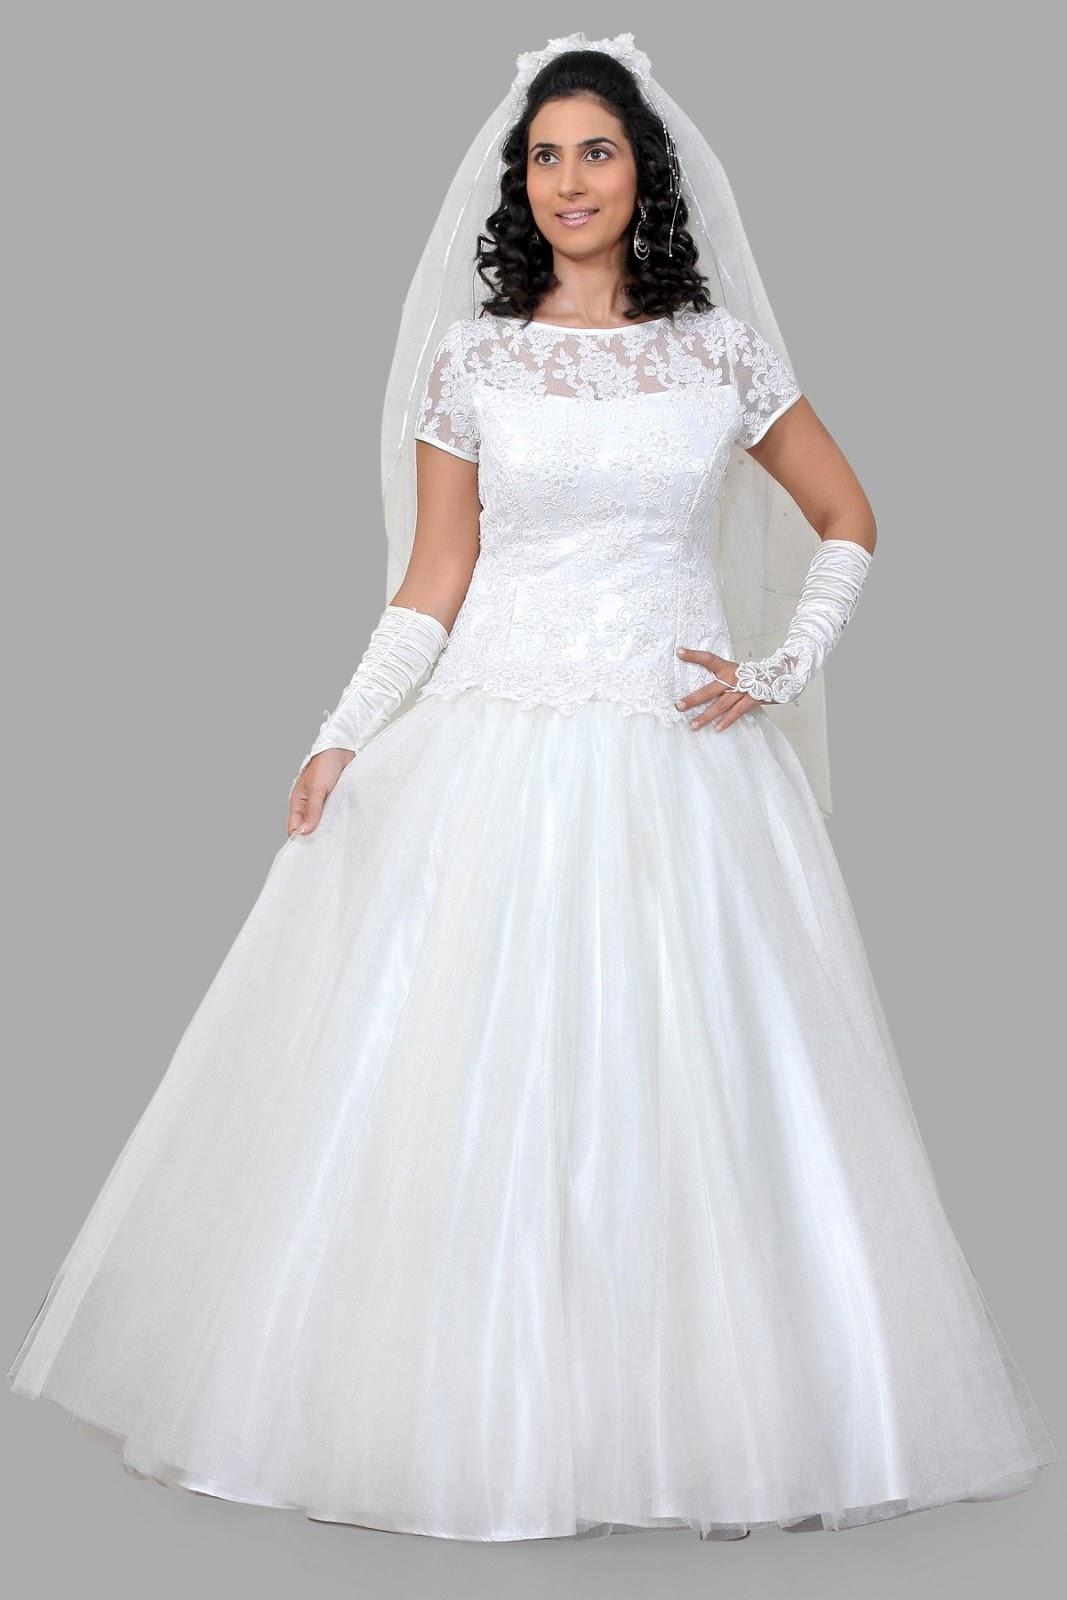 Wedding Dresses Nyc Cheap Wedding Dresses Cold Climates